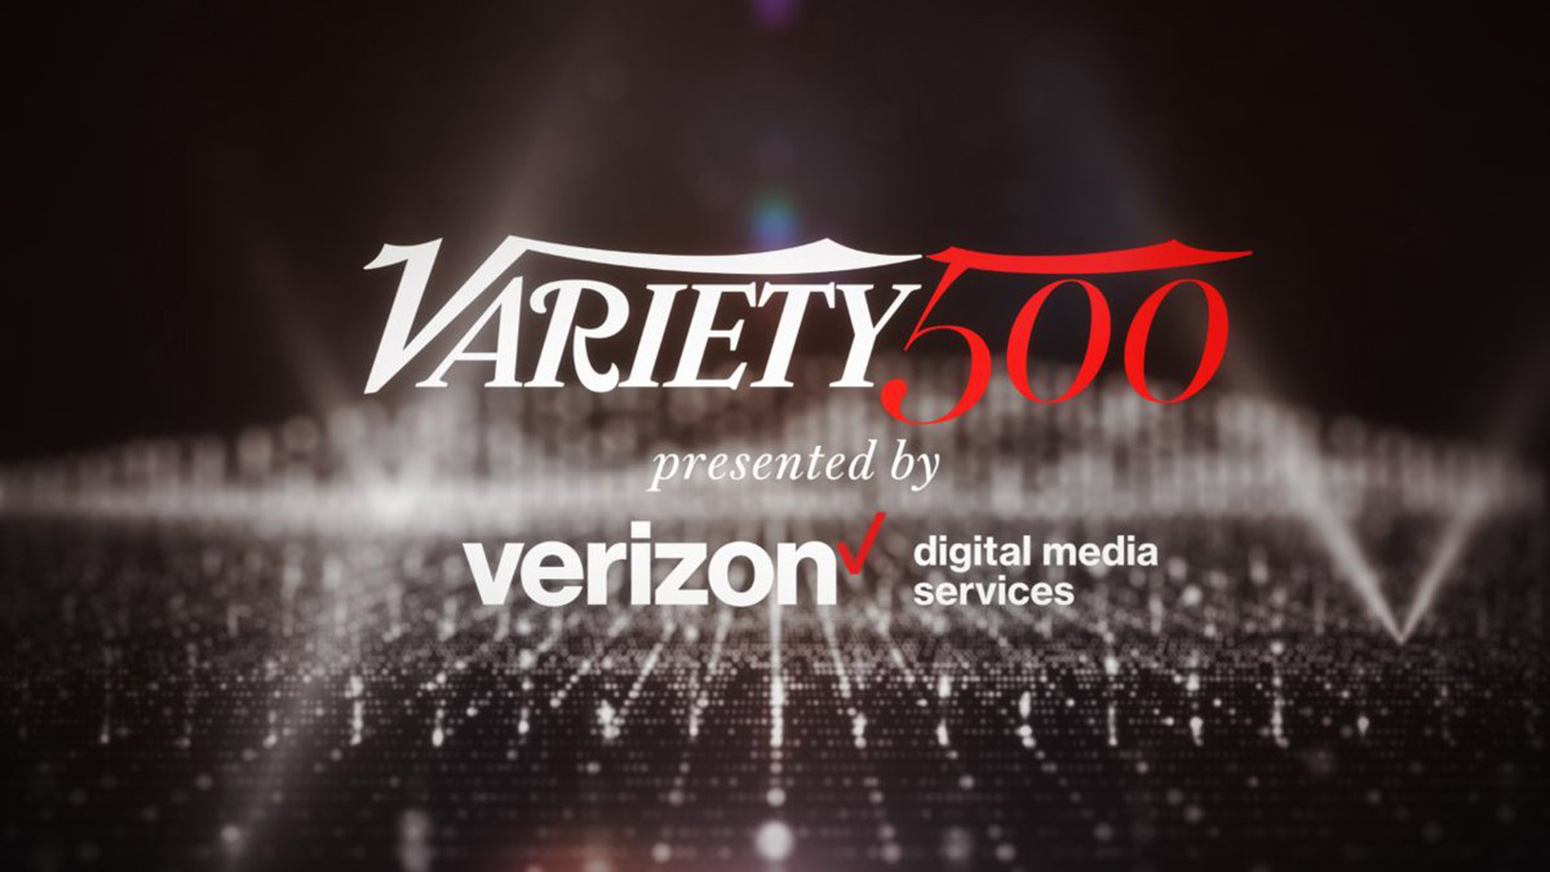 Variety500 presented by Verizon logo